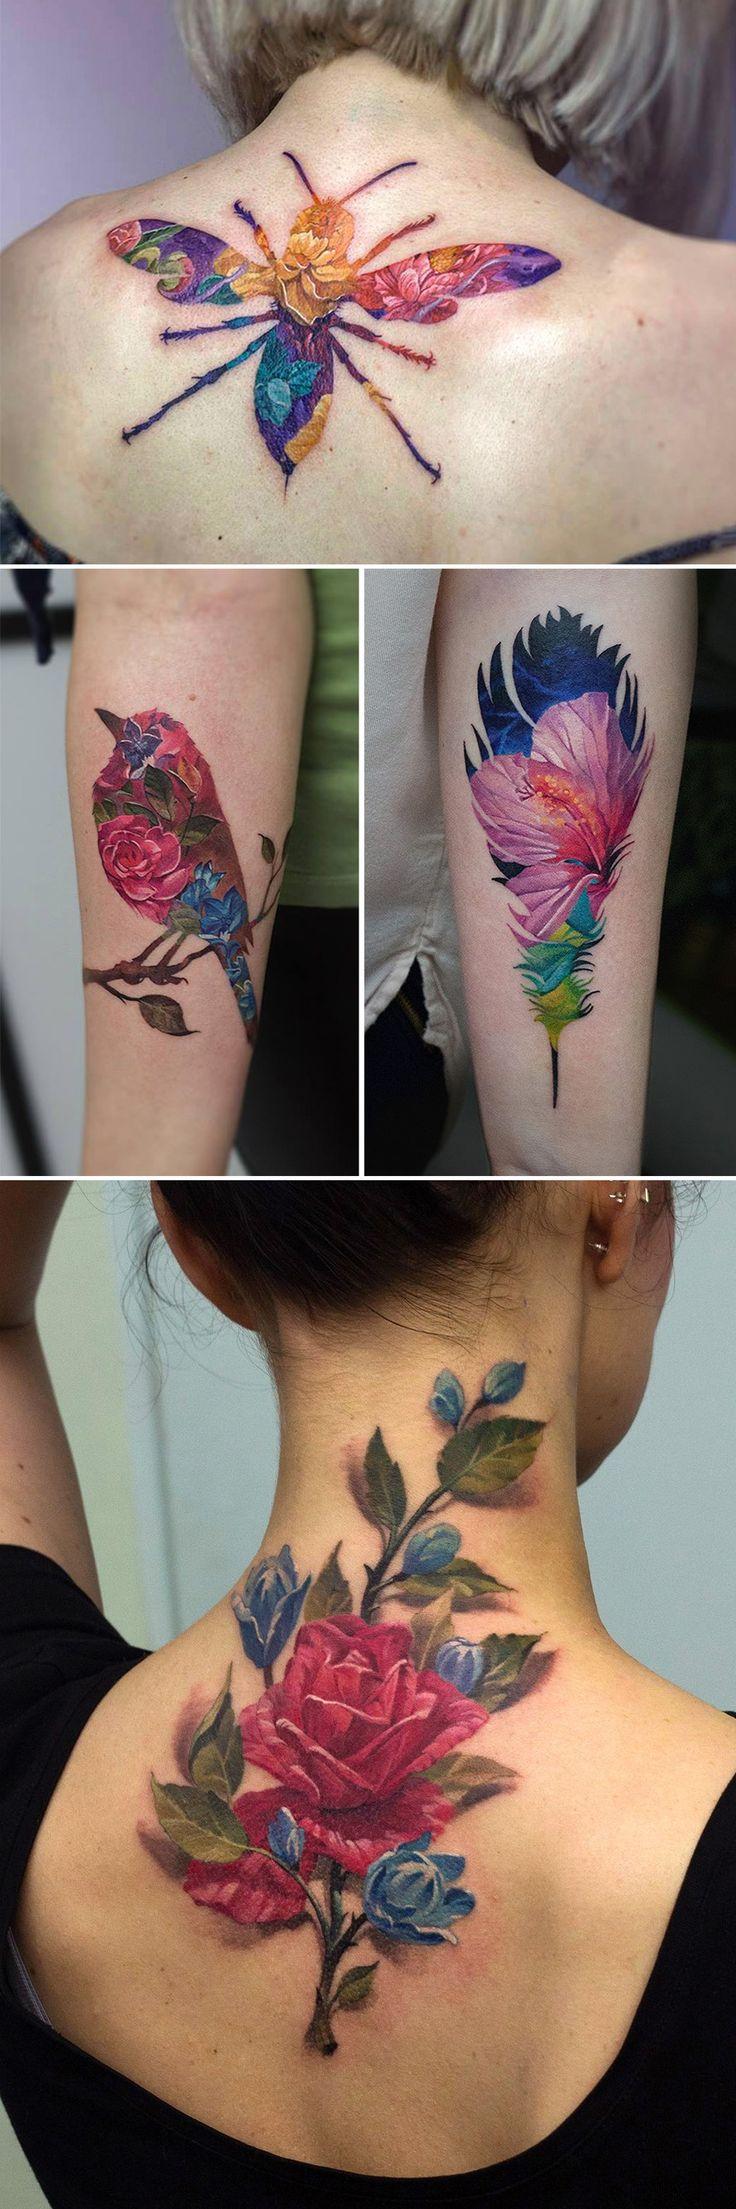 1000 Ide Tentang Tato Henna Di Pinterest Inai Mehndi Dan